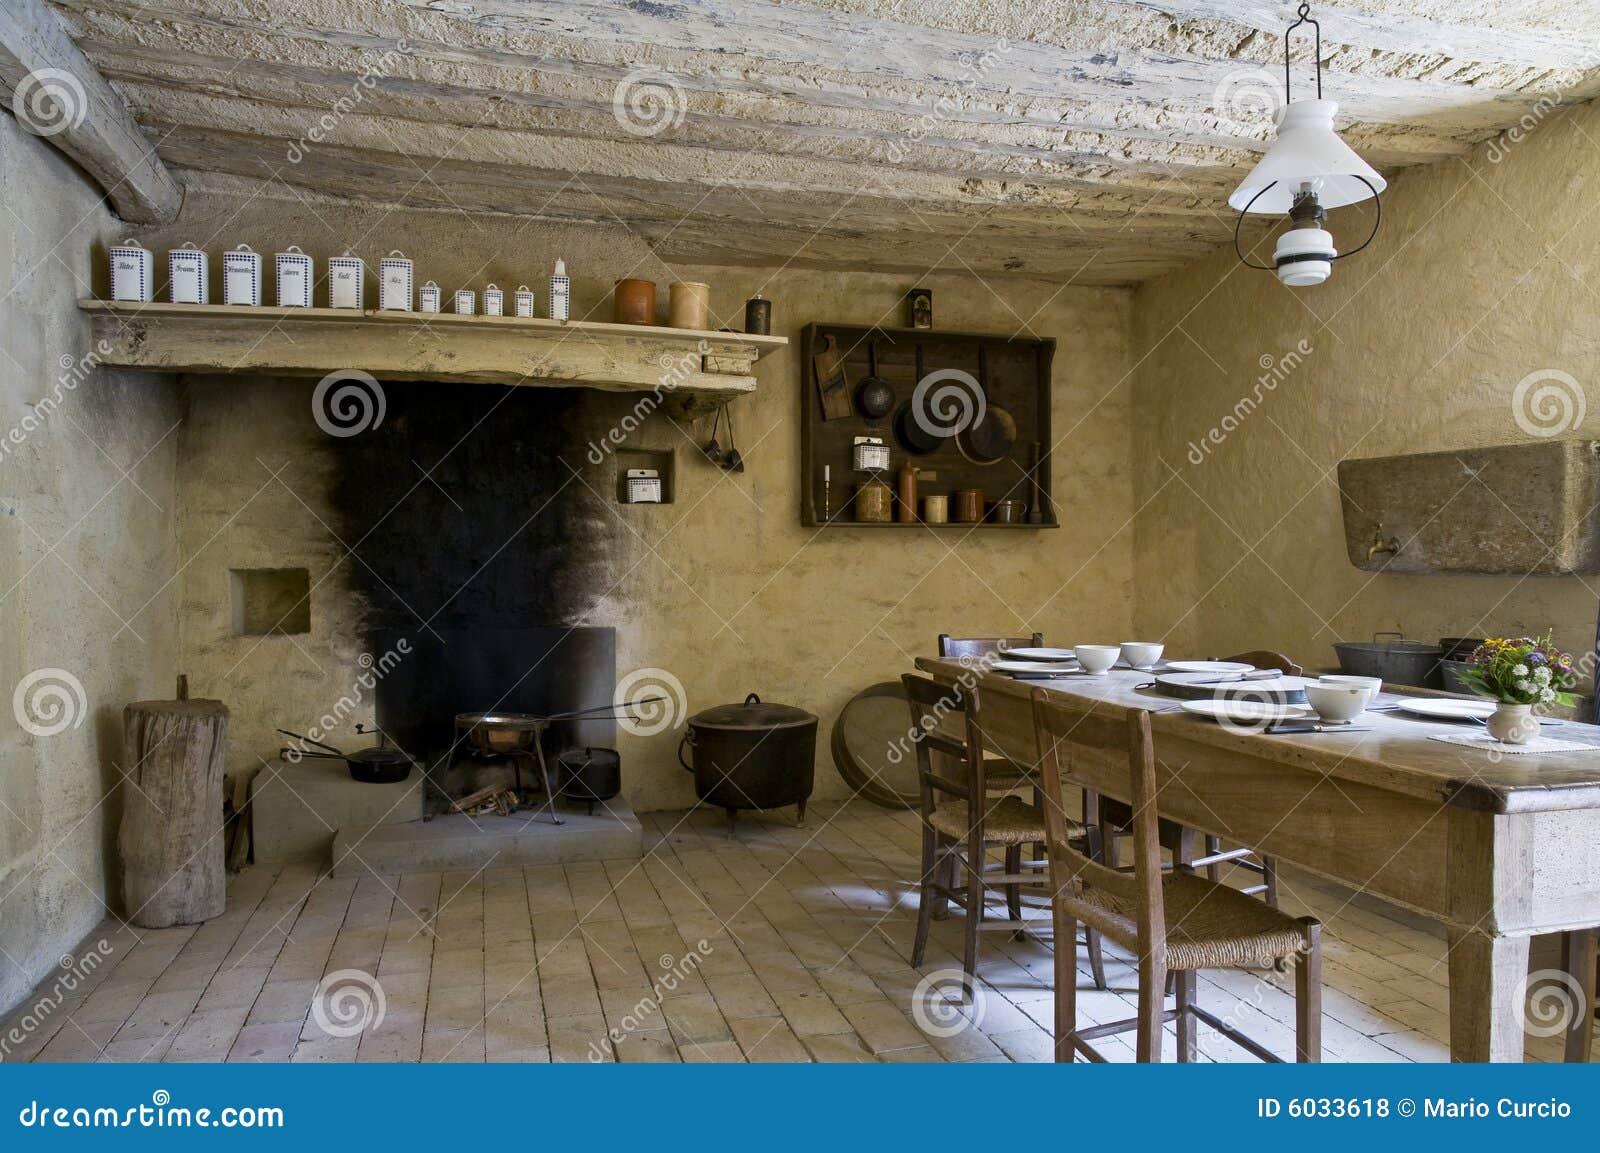 Cucinando E Mangiare Nella Cucina Rustica Di Una Casa Europea Antica. #81A229 1300 953 Foto Di Case Con Cucina A Vista